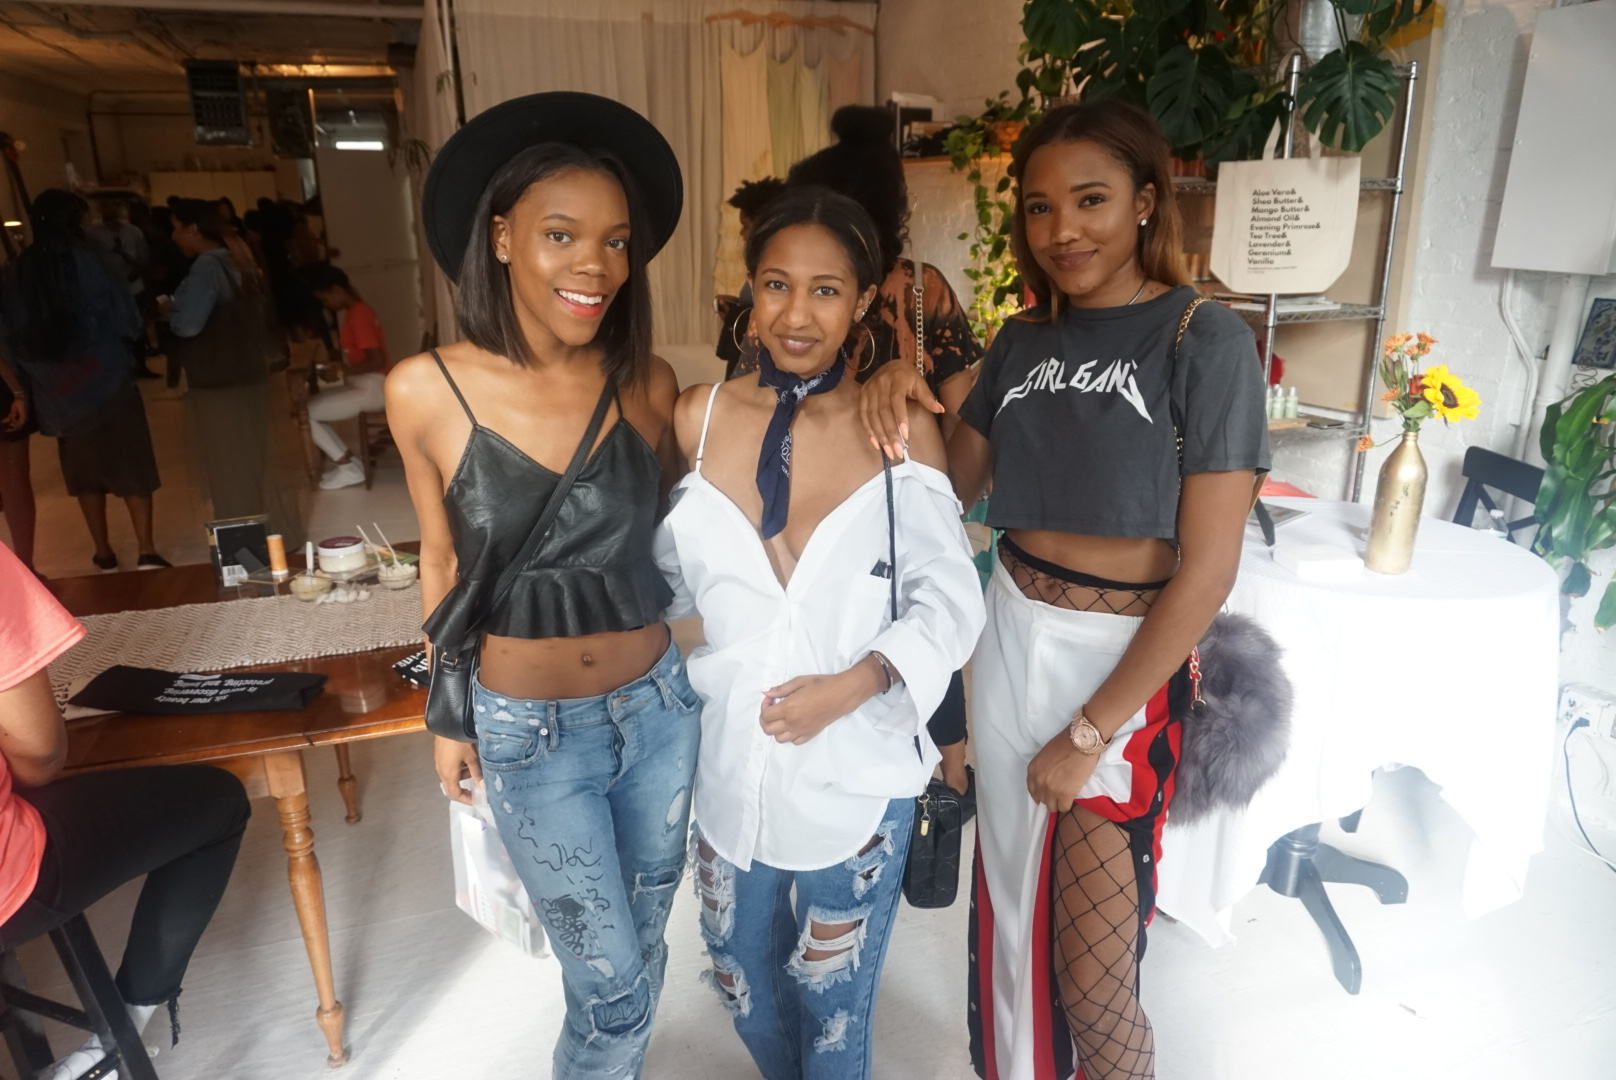 Brittney + Chandler + Shema = 3/5 of  Creative Girl Gang